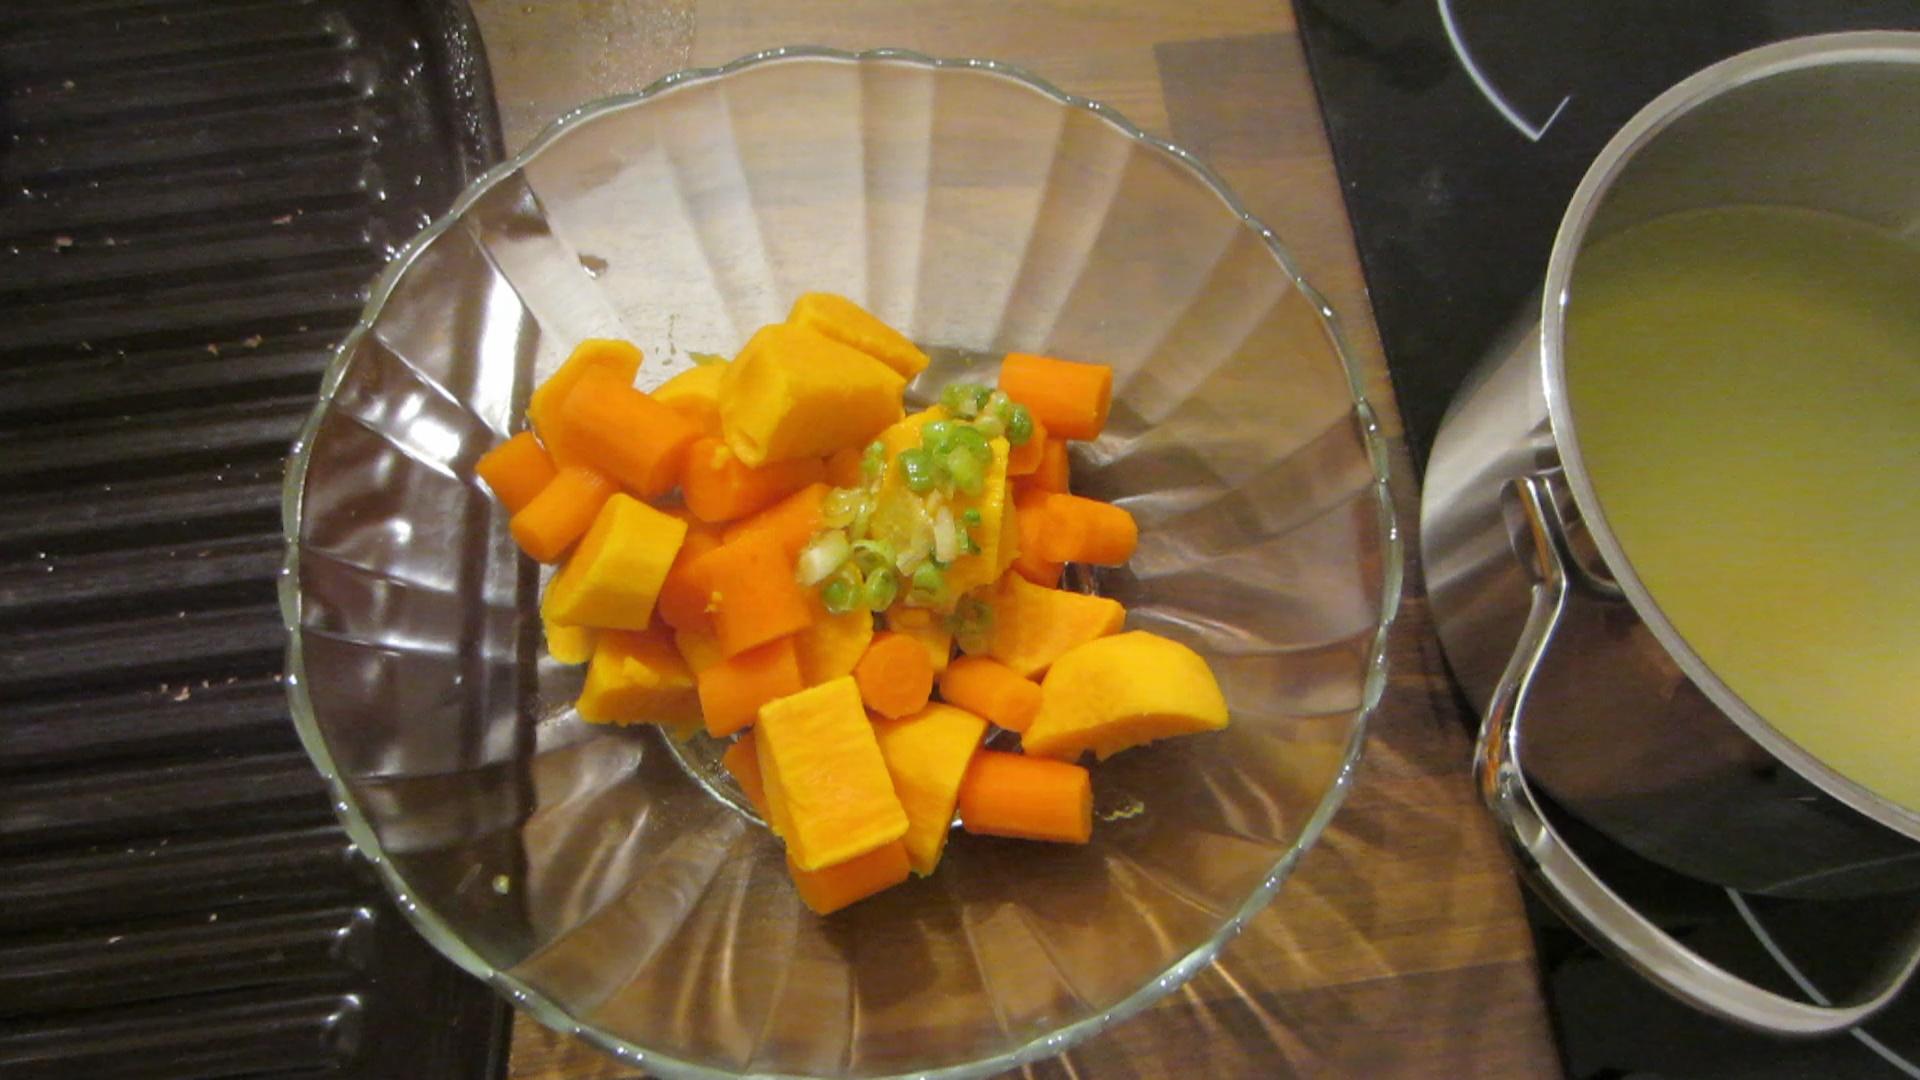 2014-04-11-Sweet-potato-carrot-mash-12.jpg